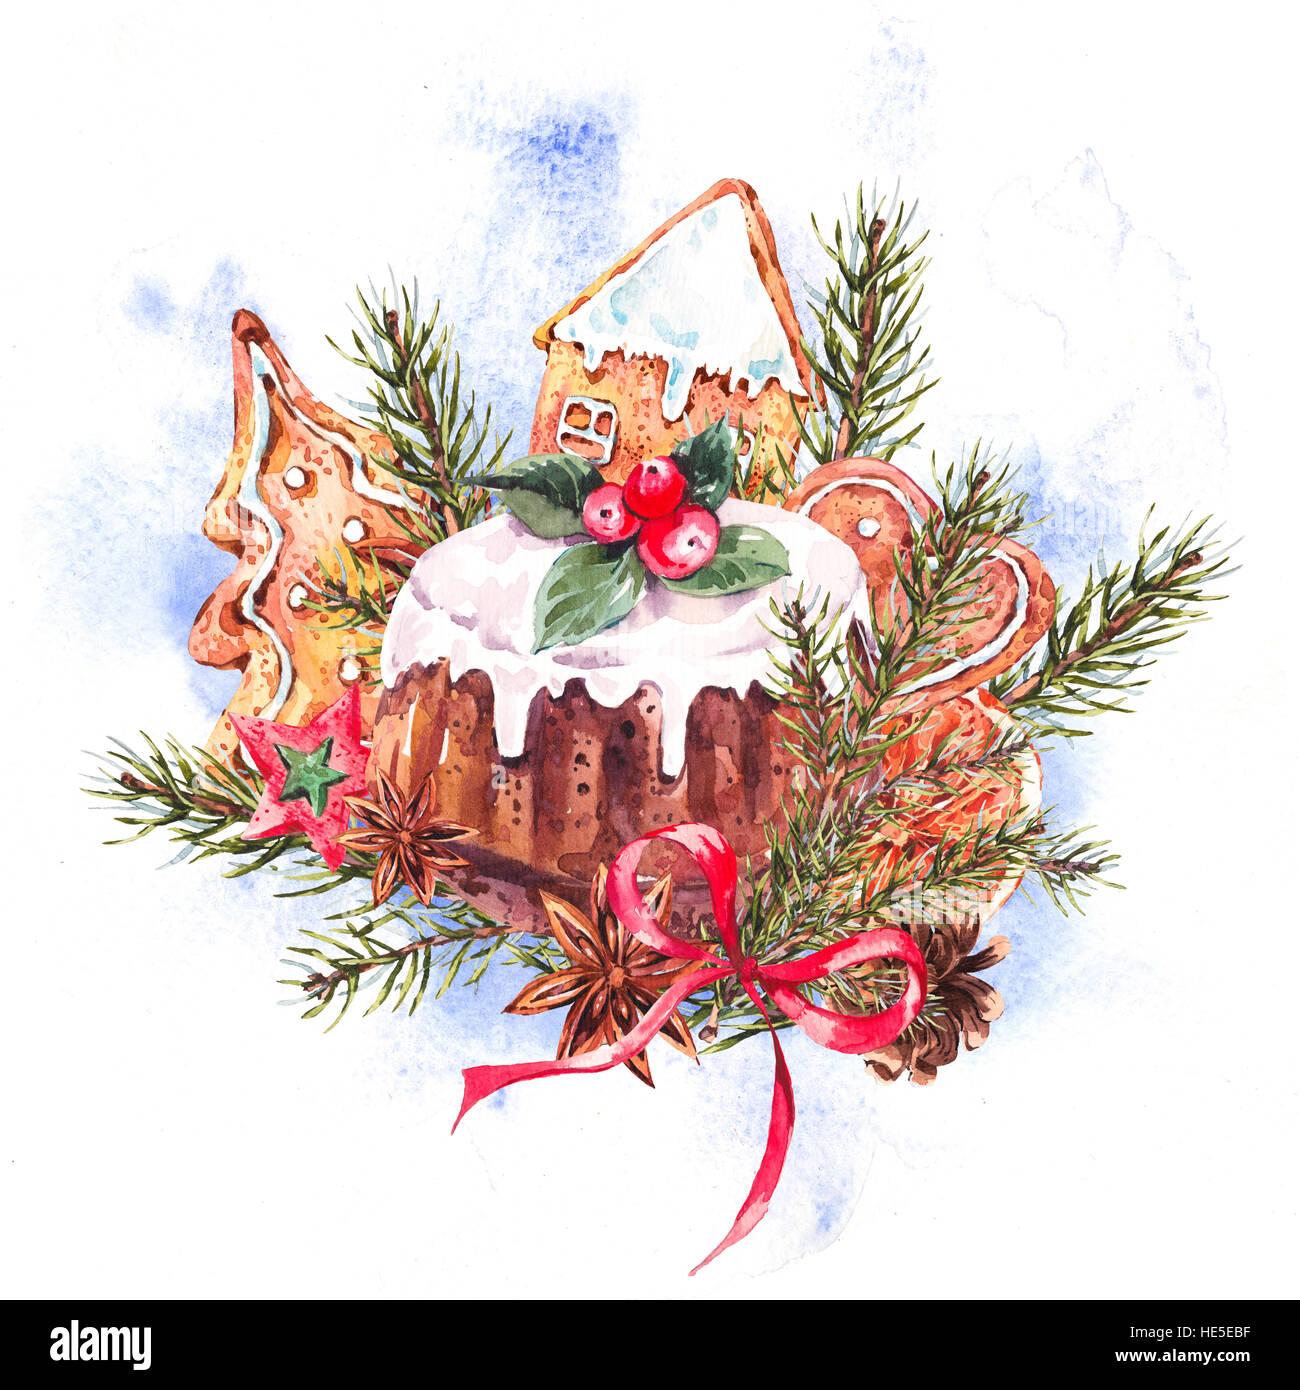 christmas pudding illustration stock photos christmas. Black Bedroom Furniture Sets. Home Design Ideas